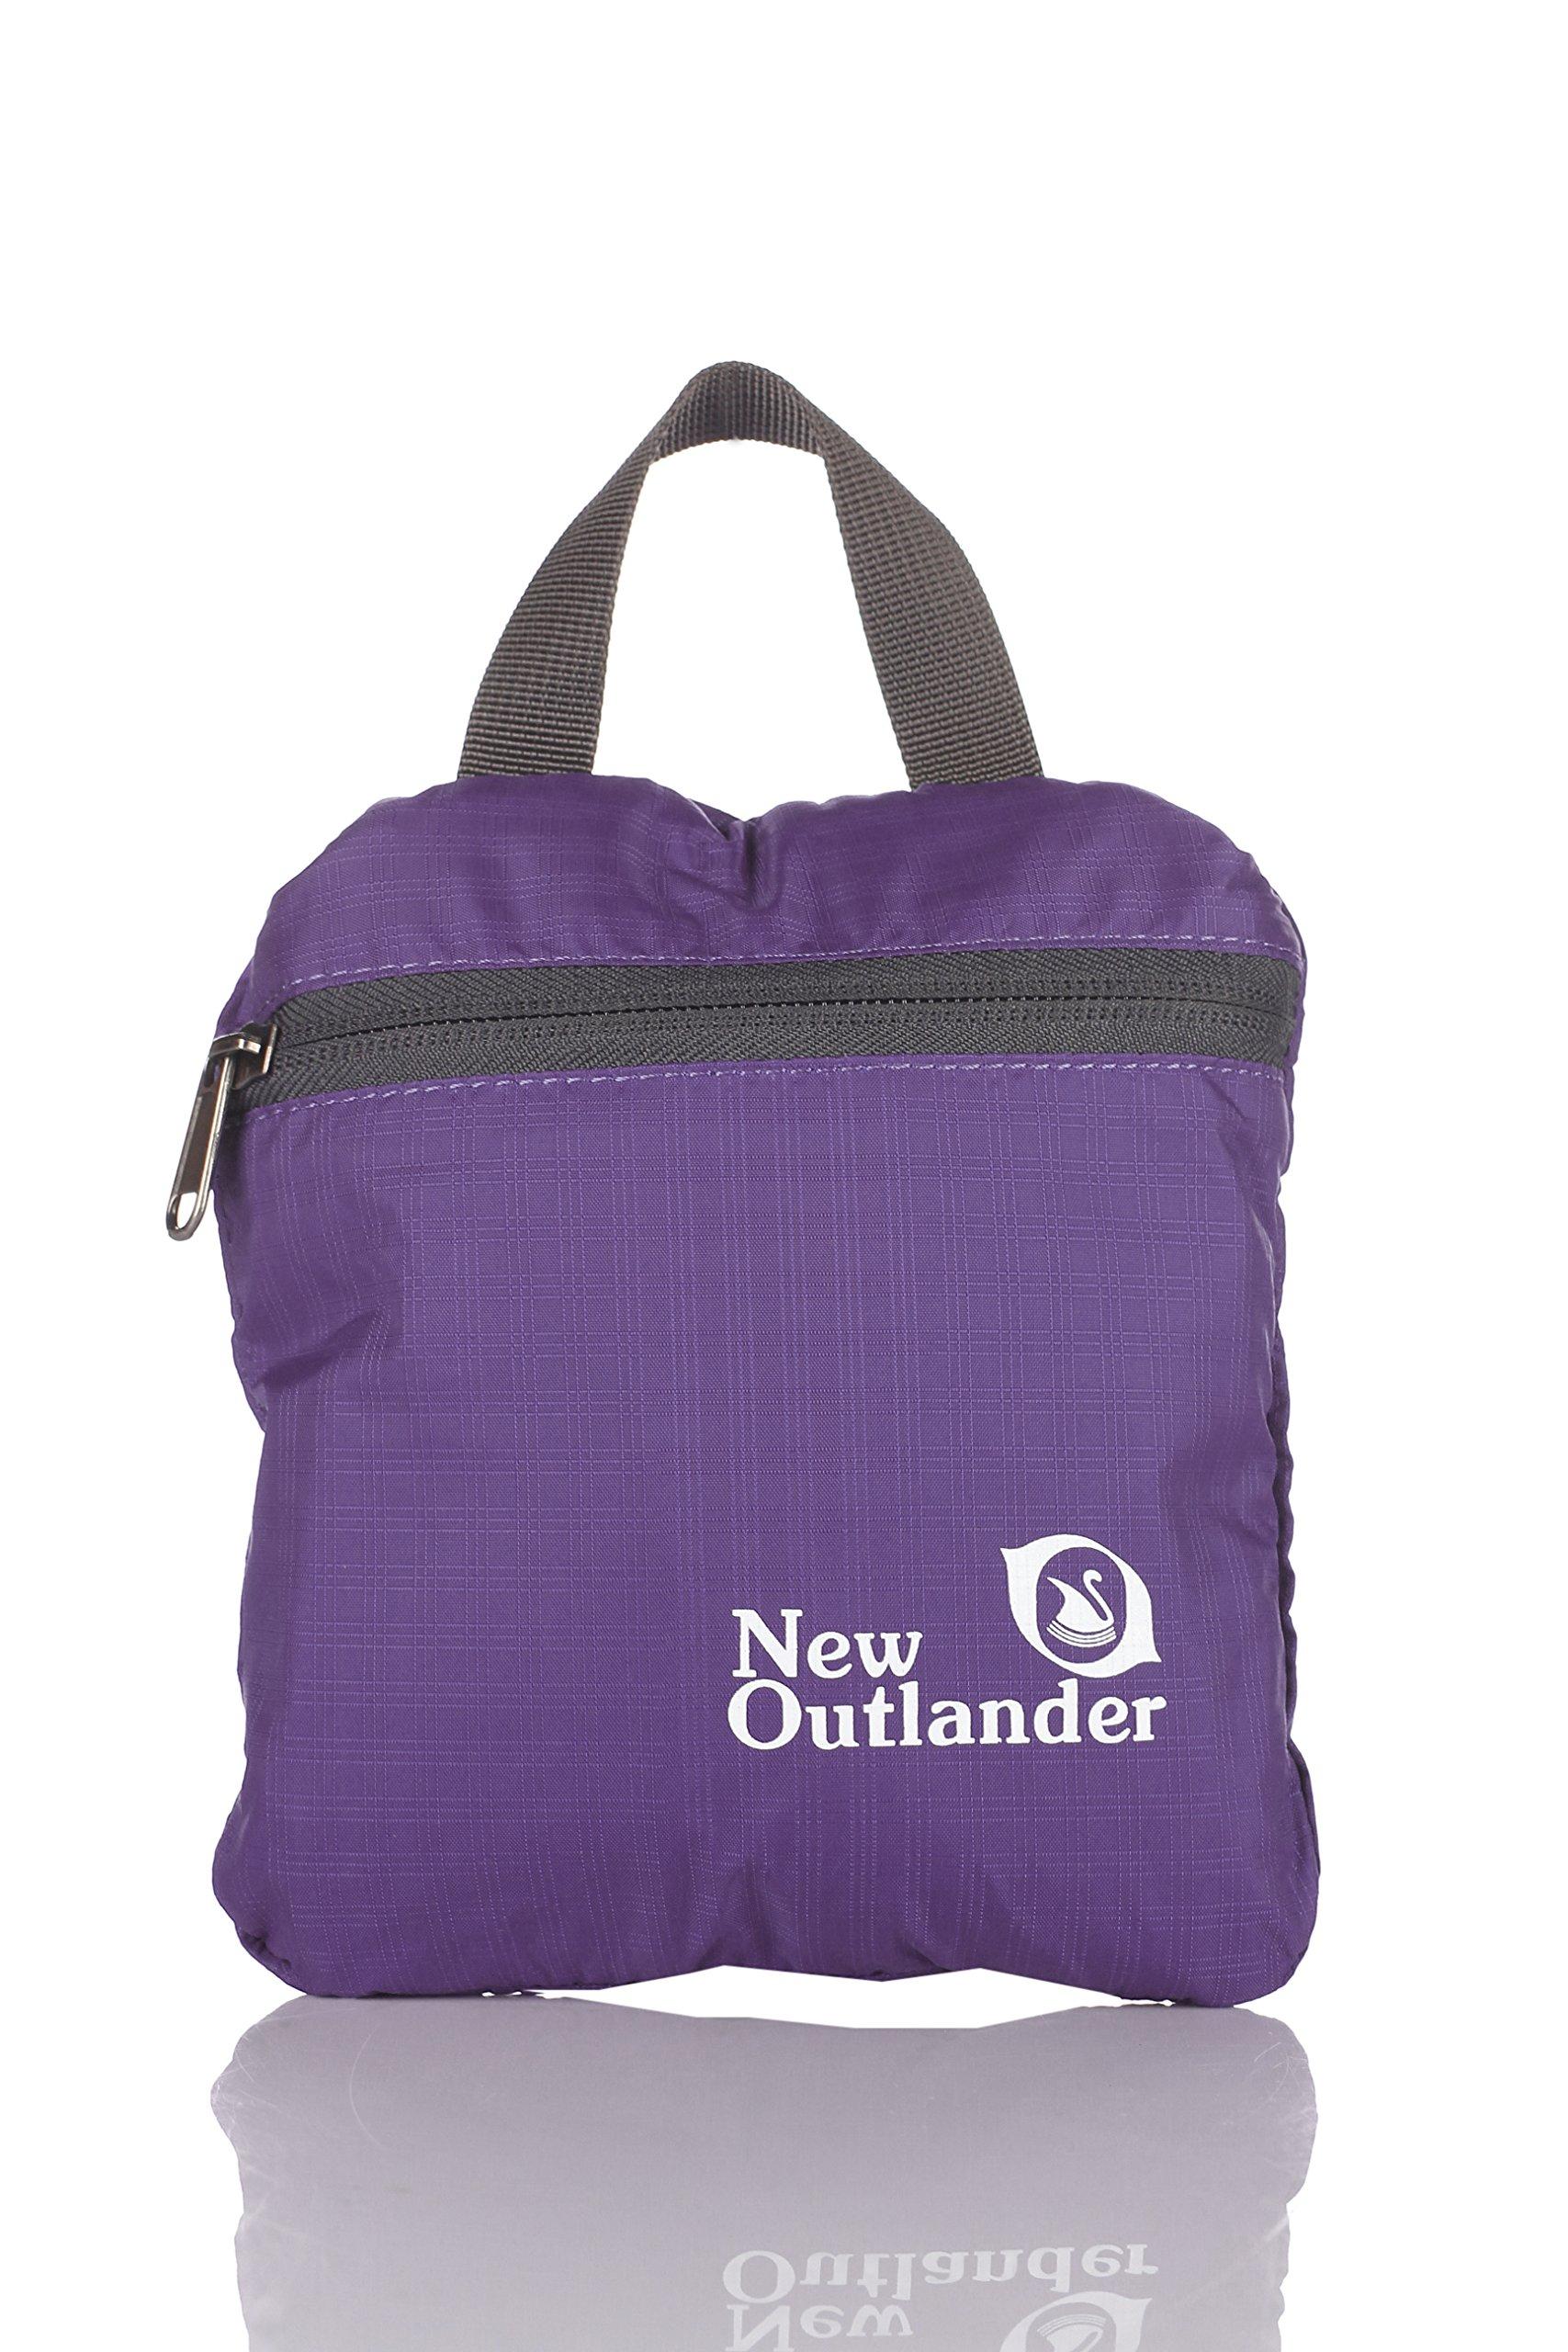 Outlander Packable Handy Lightweight Travel Hiking Backpack Daypack-Purple-L by Outlander (Image #4)